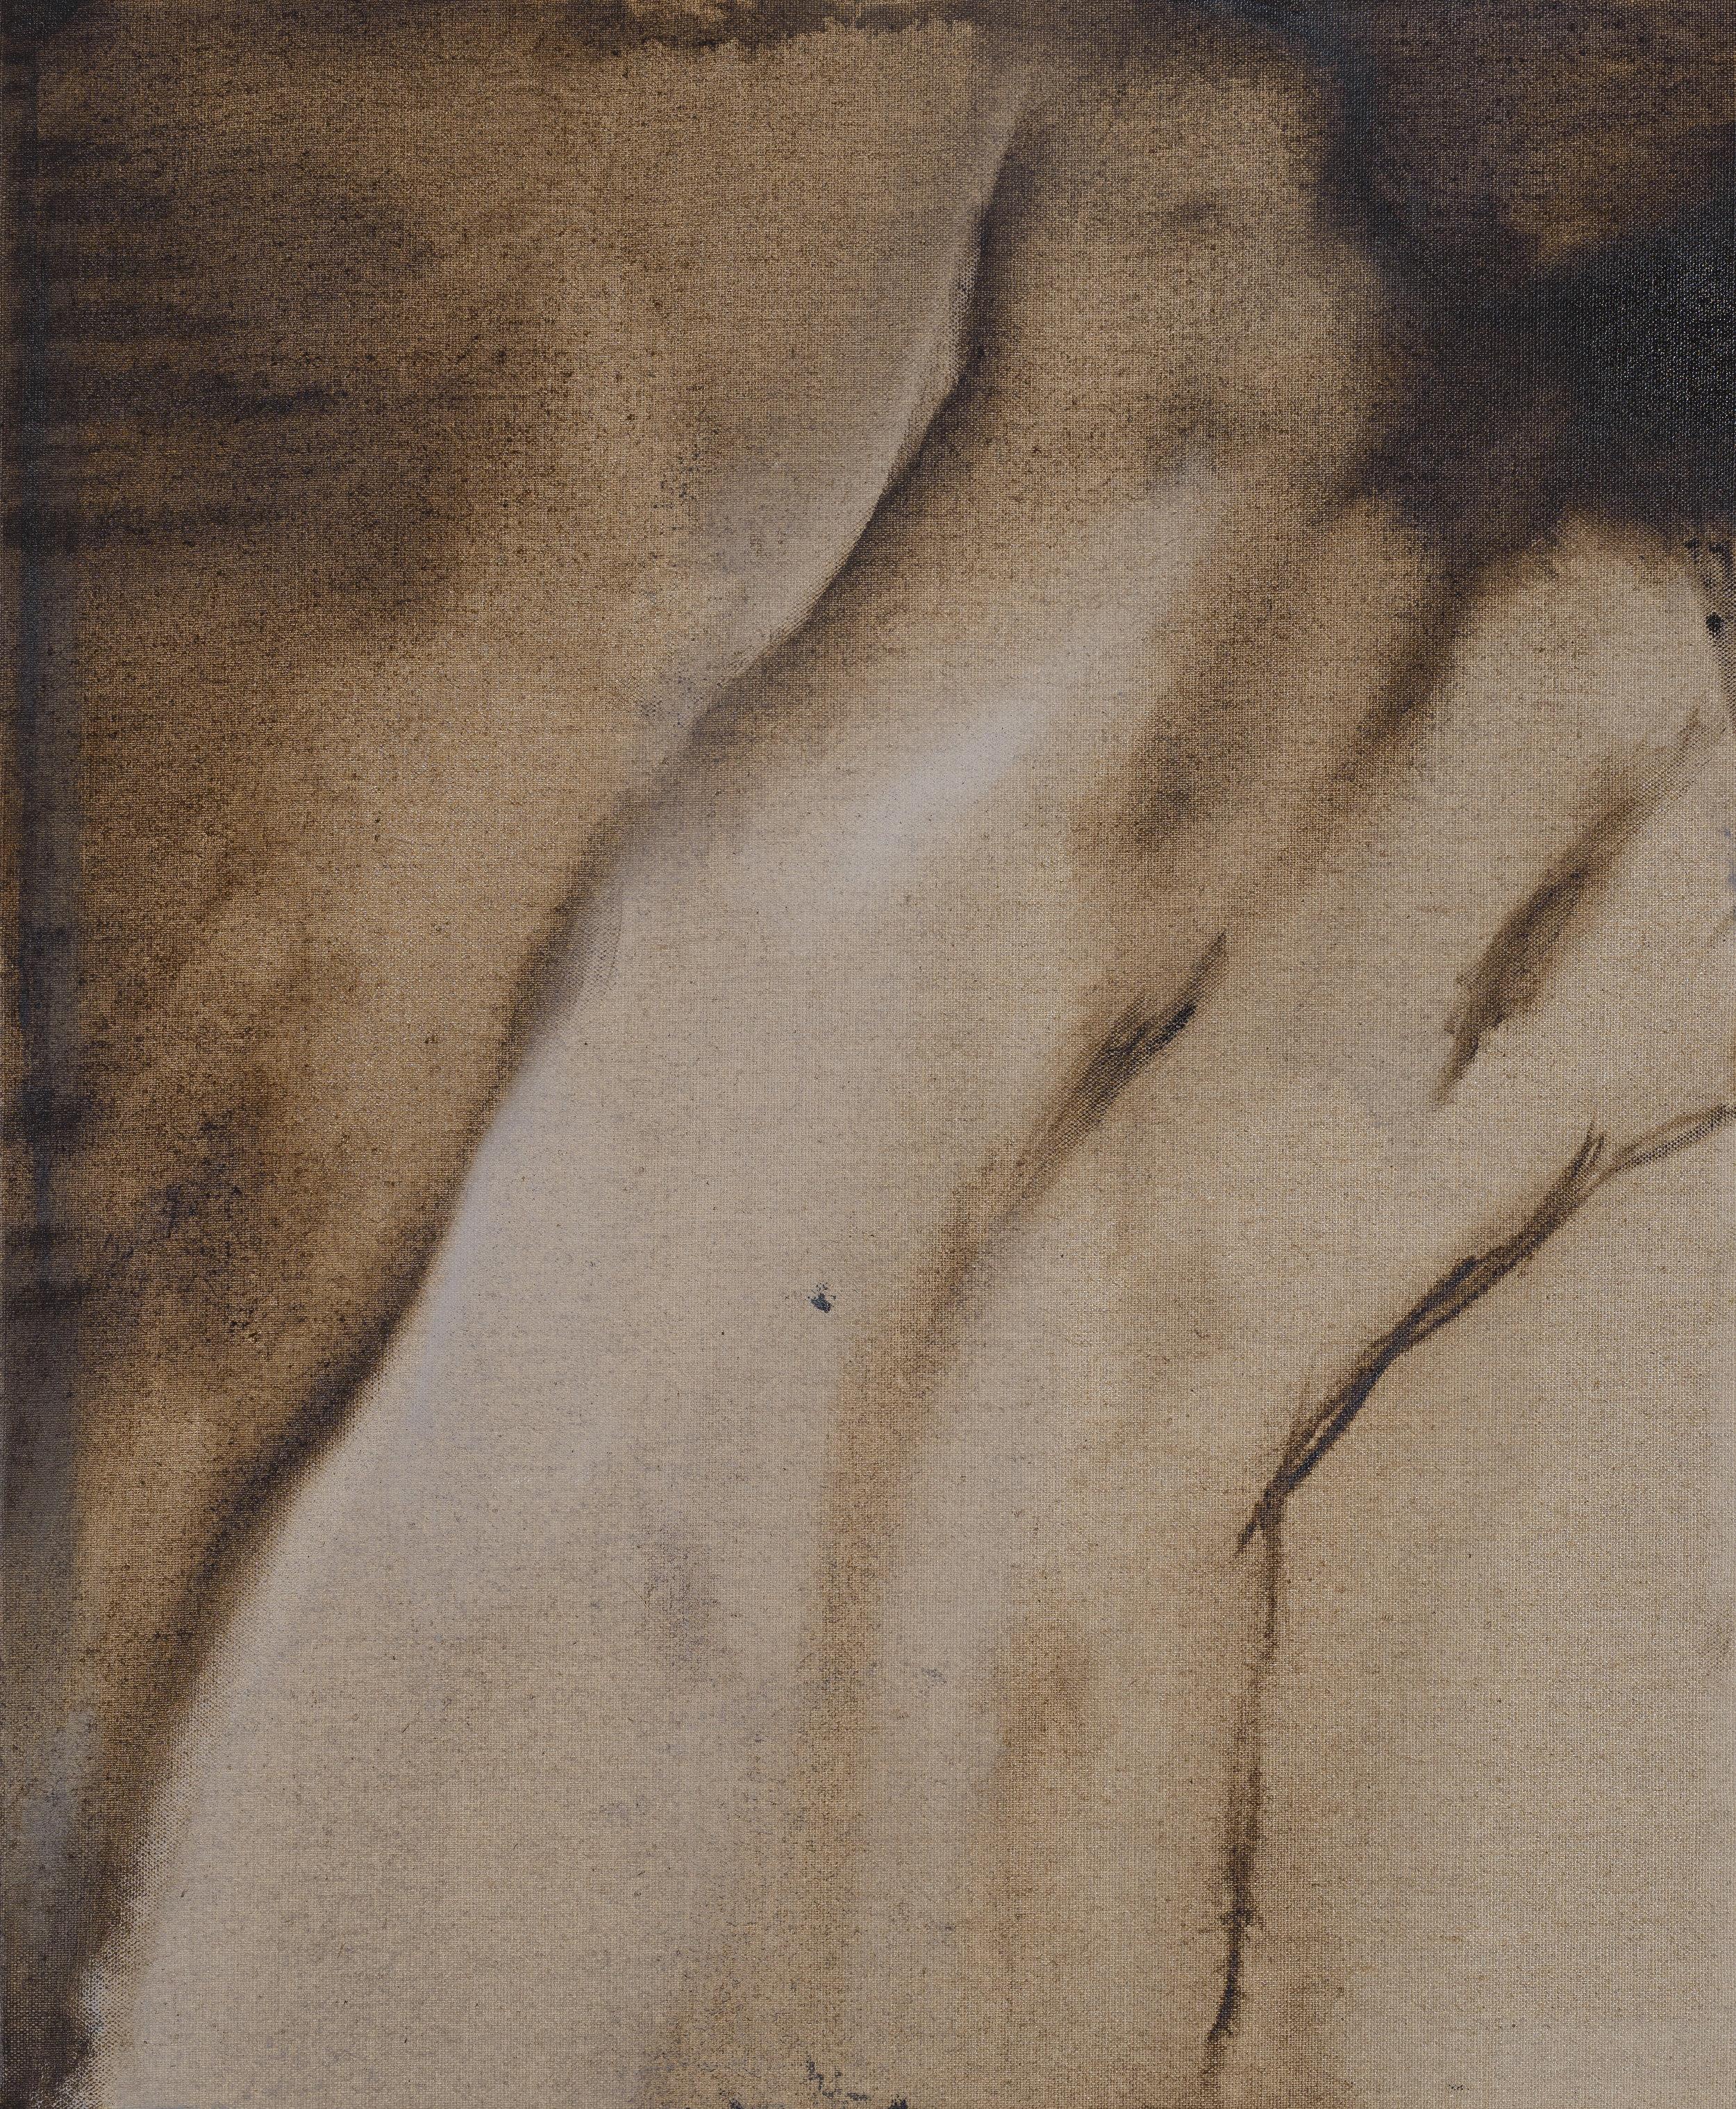 2017, Fissa 2, 44 x 66 cm.jpg